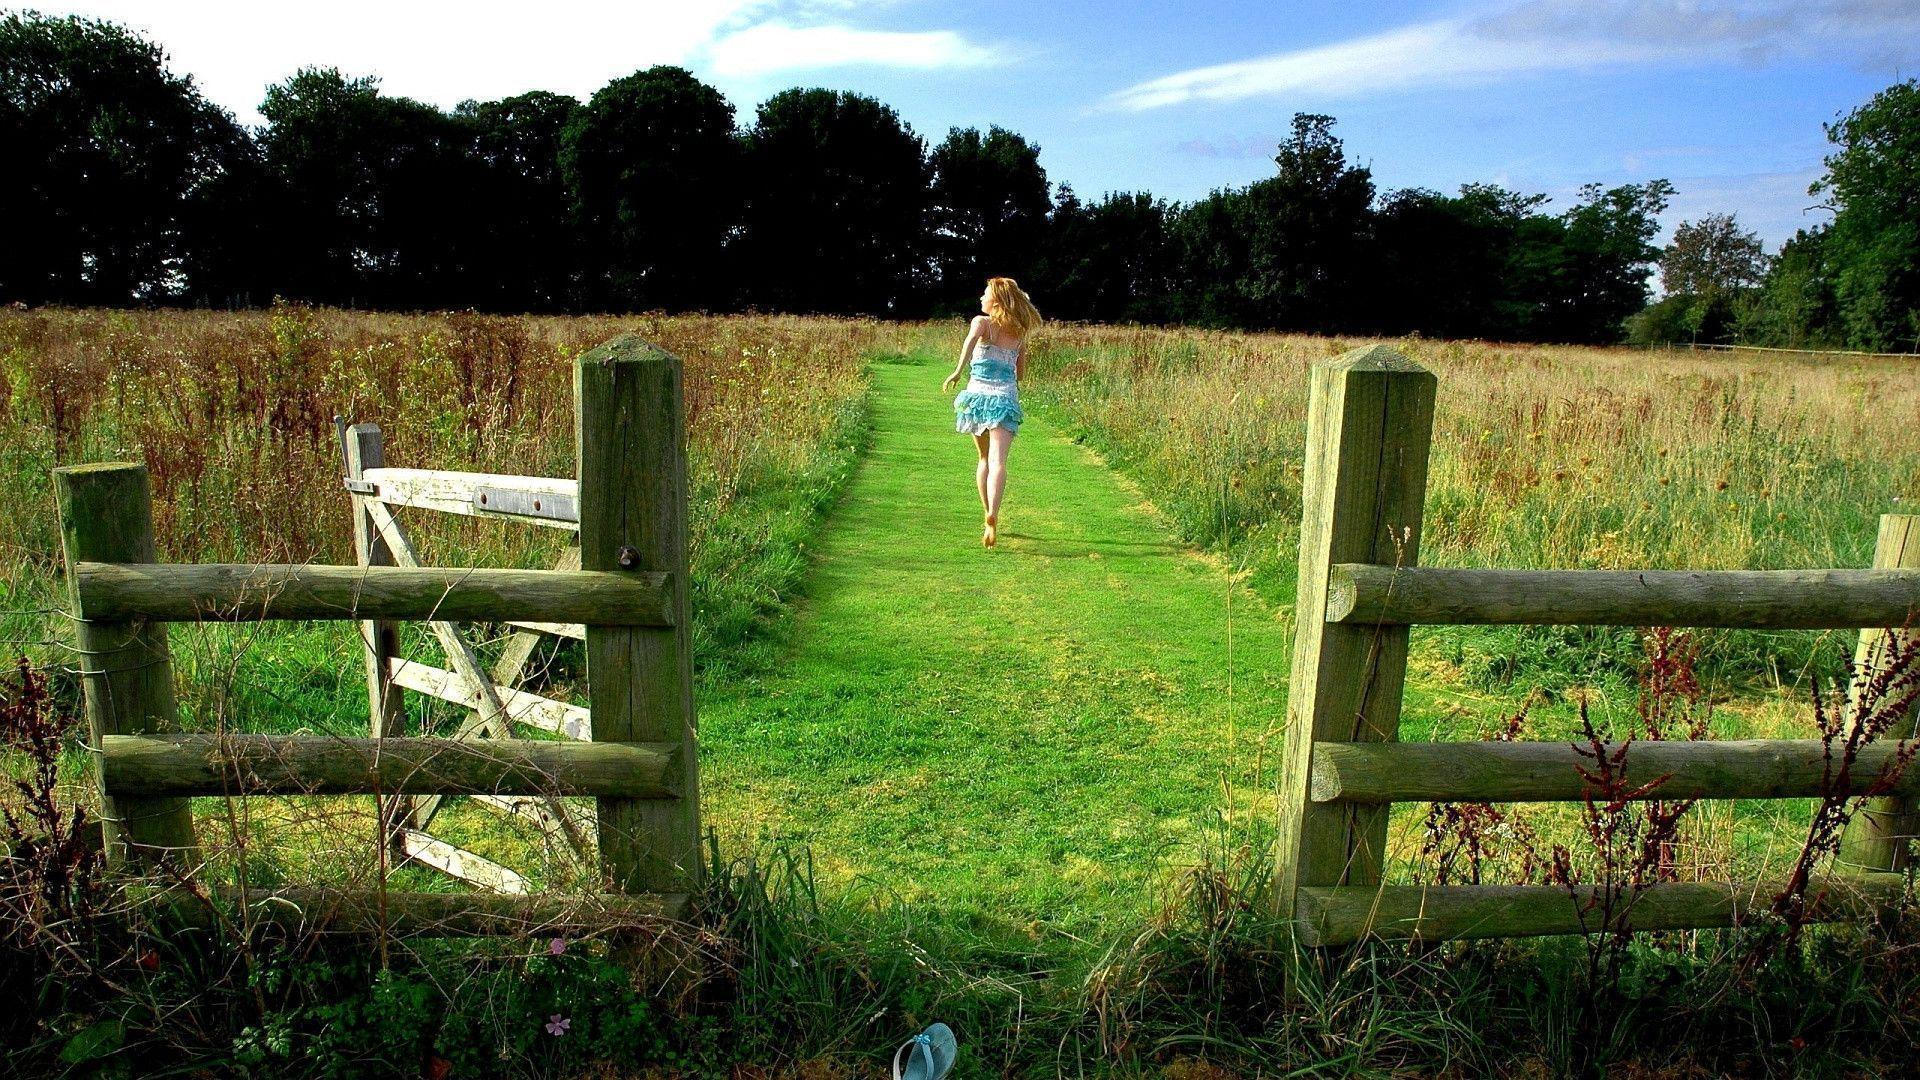 Full Hd Wallpapers Girls - Girl Running On Farm , HD Wallpaper & Backgrounds